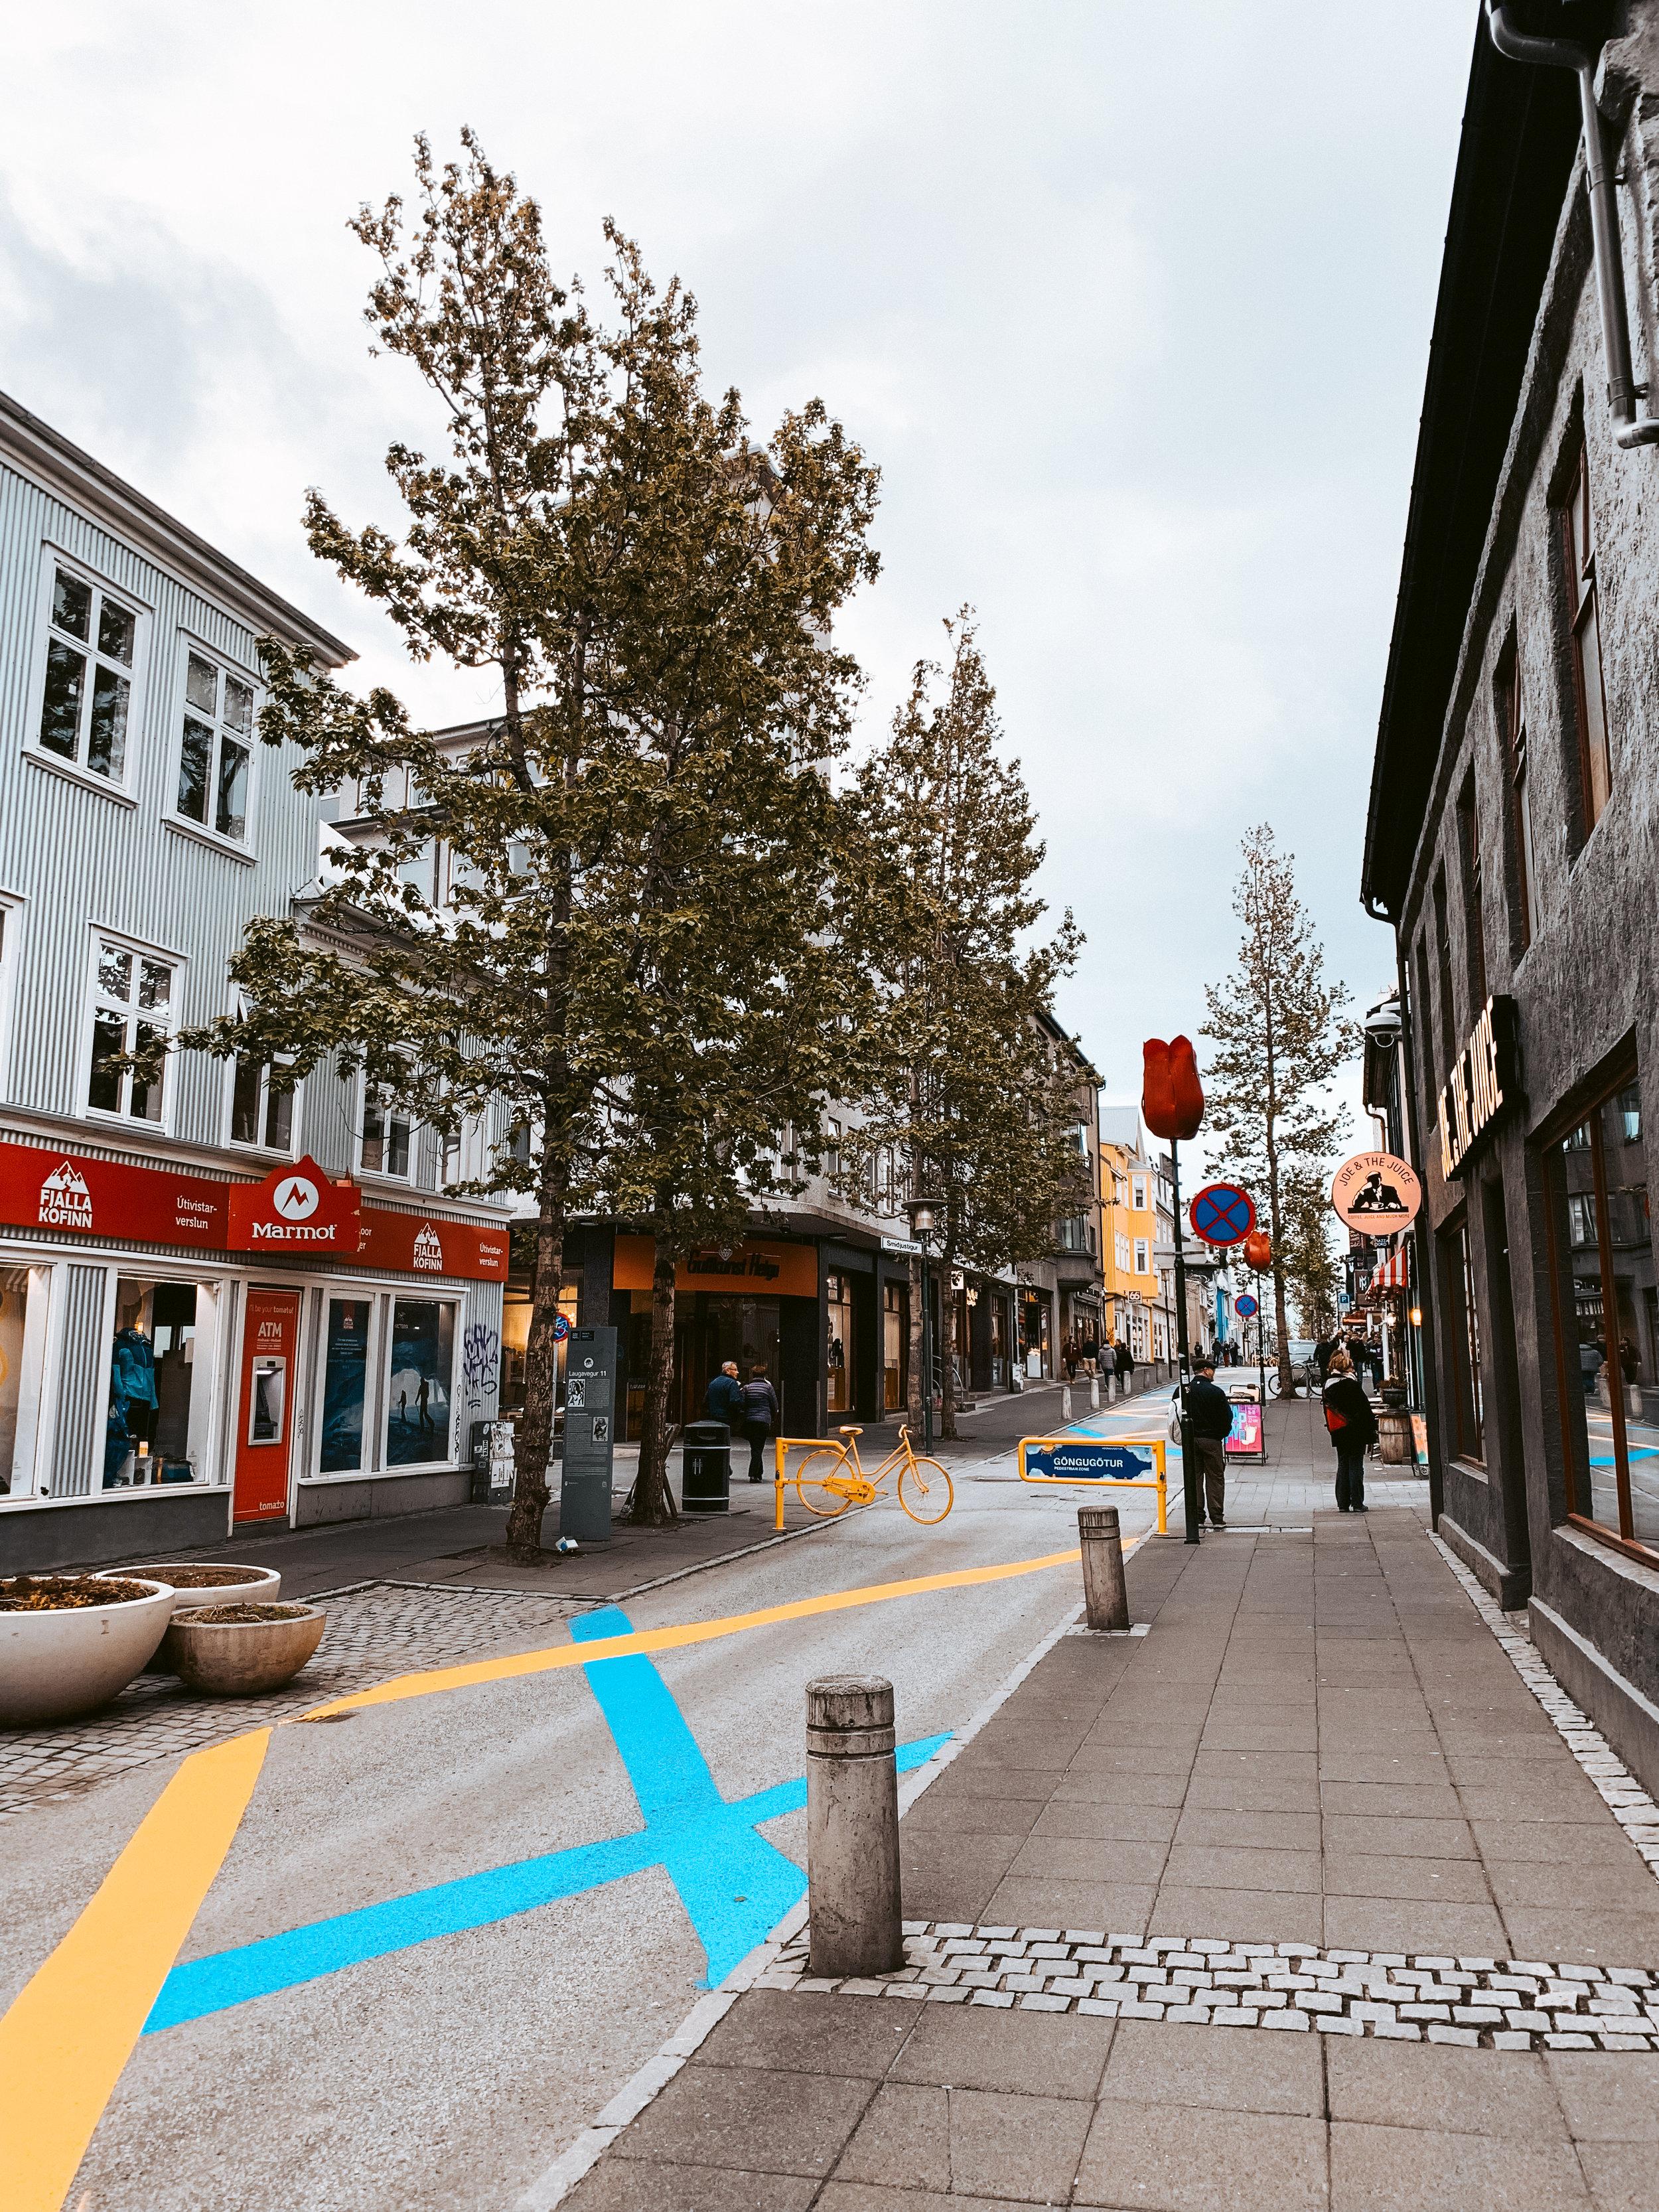 LSS Downtown Reykjavik Iceland